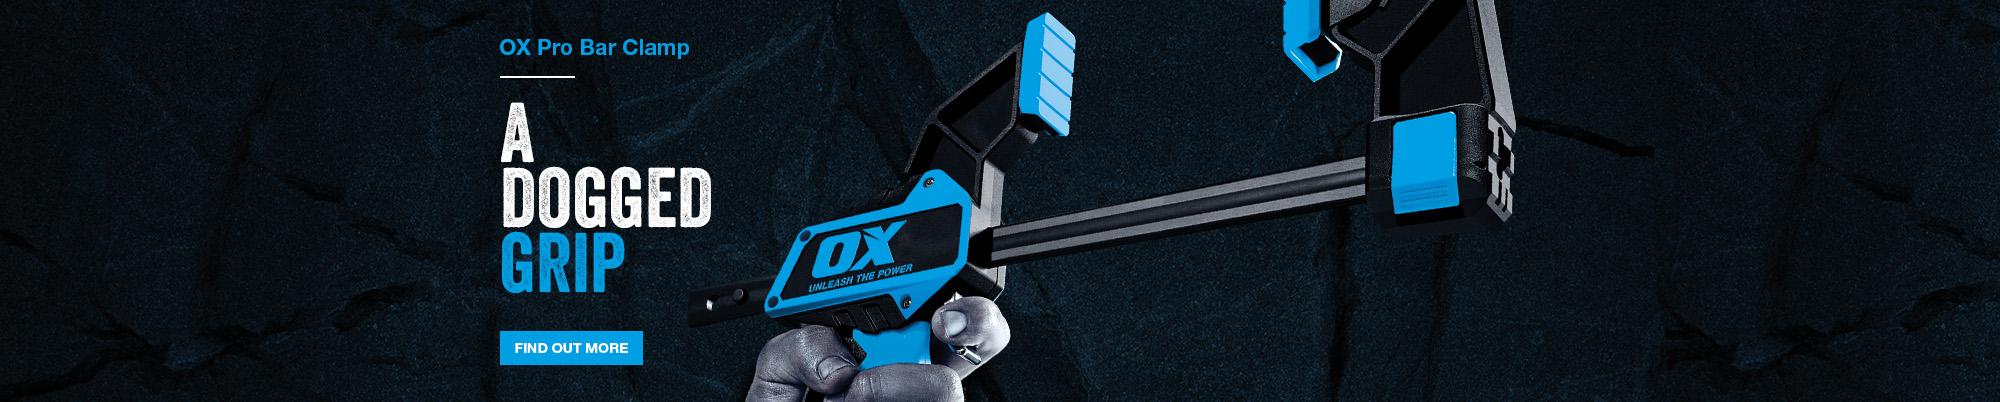 Ox Pro Bar Clamp